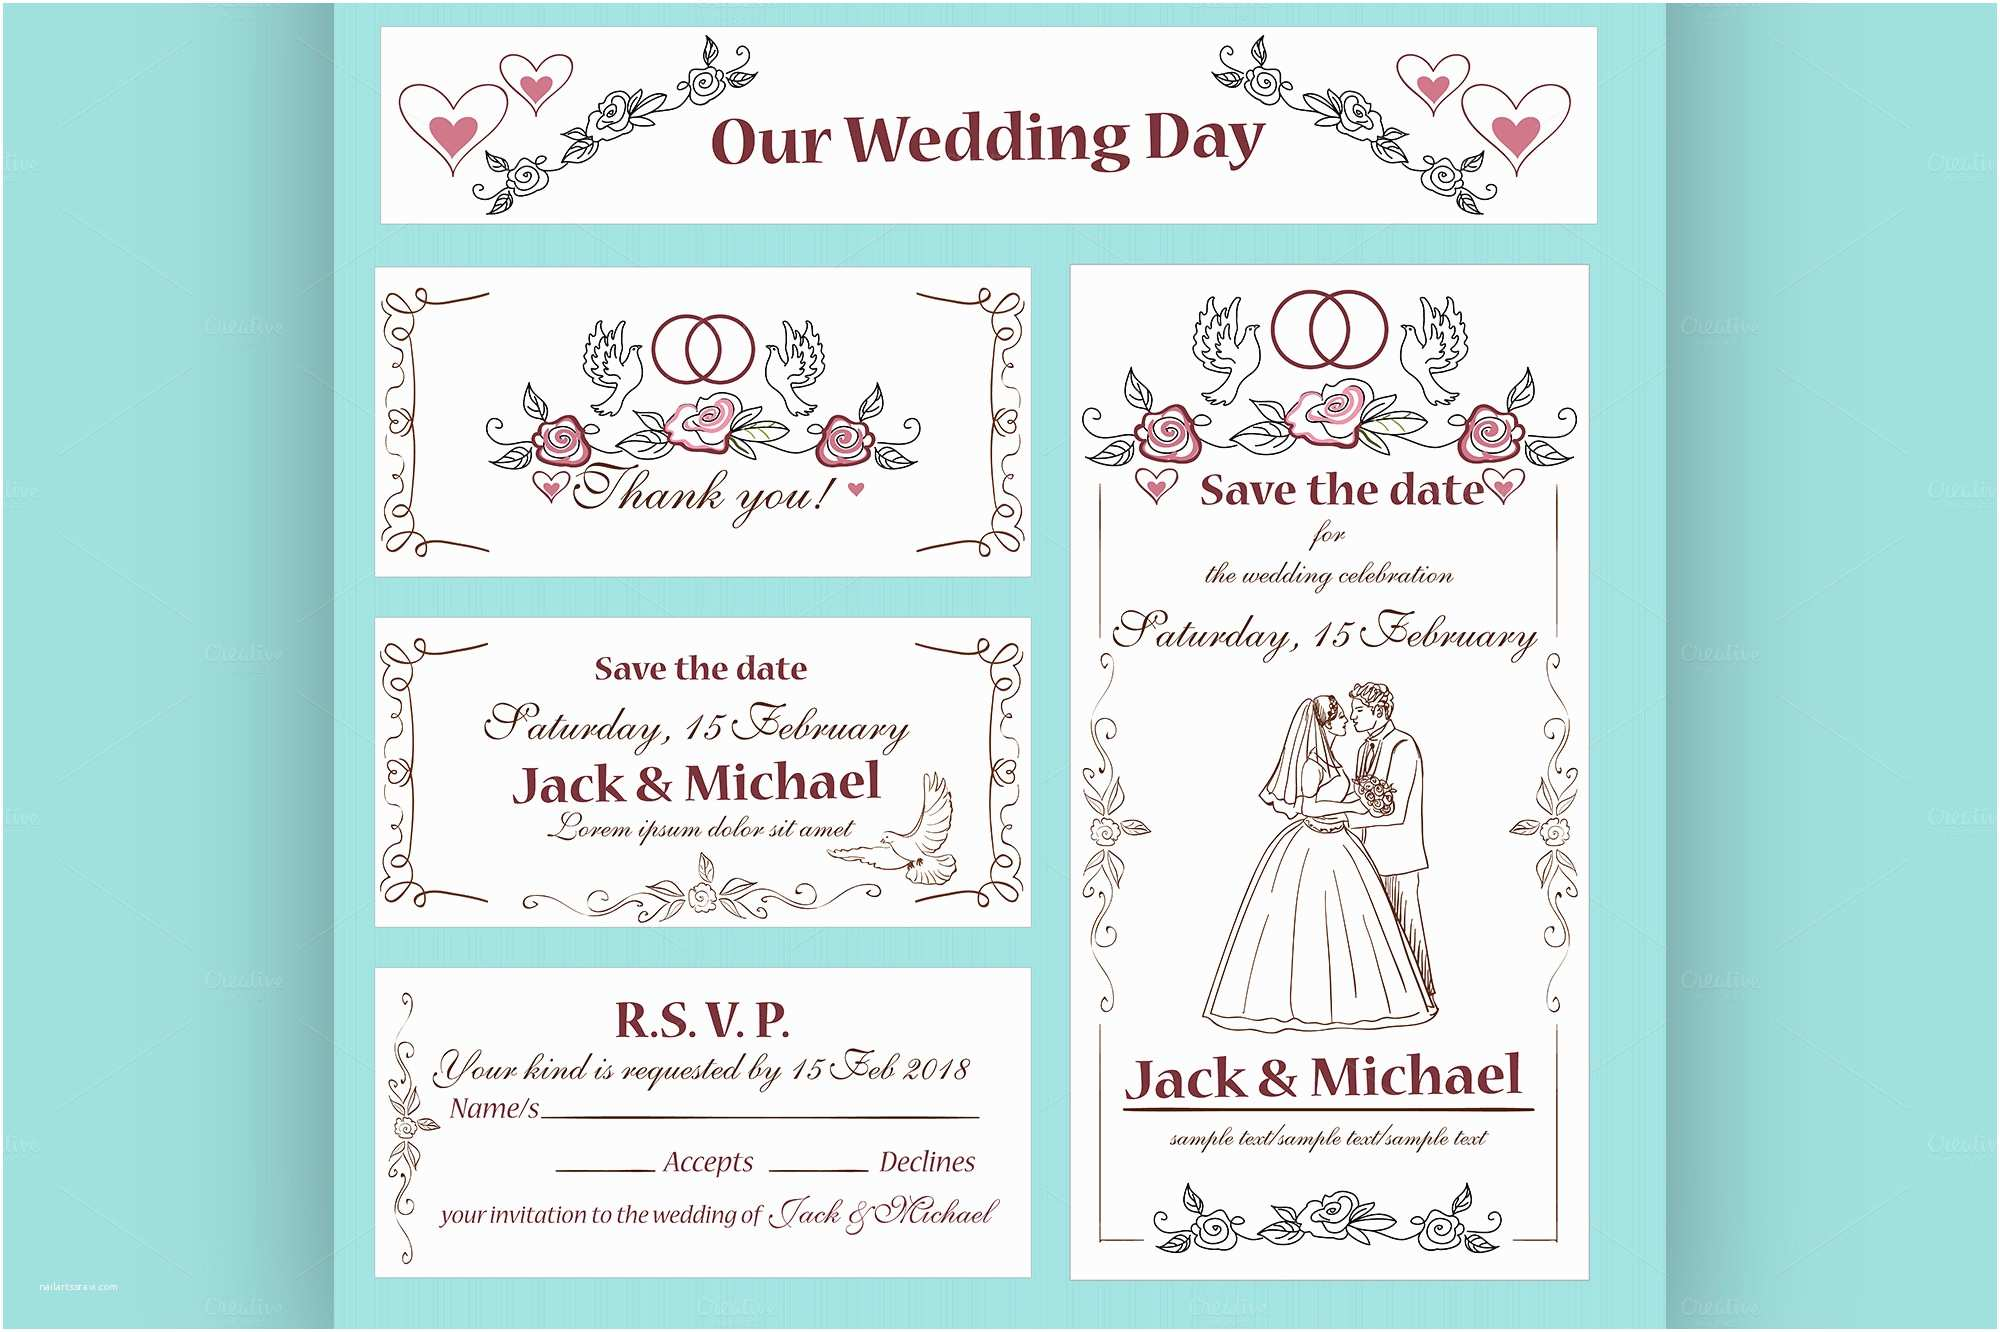 Wedding Invitation Flyer Template Wedding Invitation Thank You Card Flyer Templates On